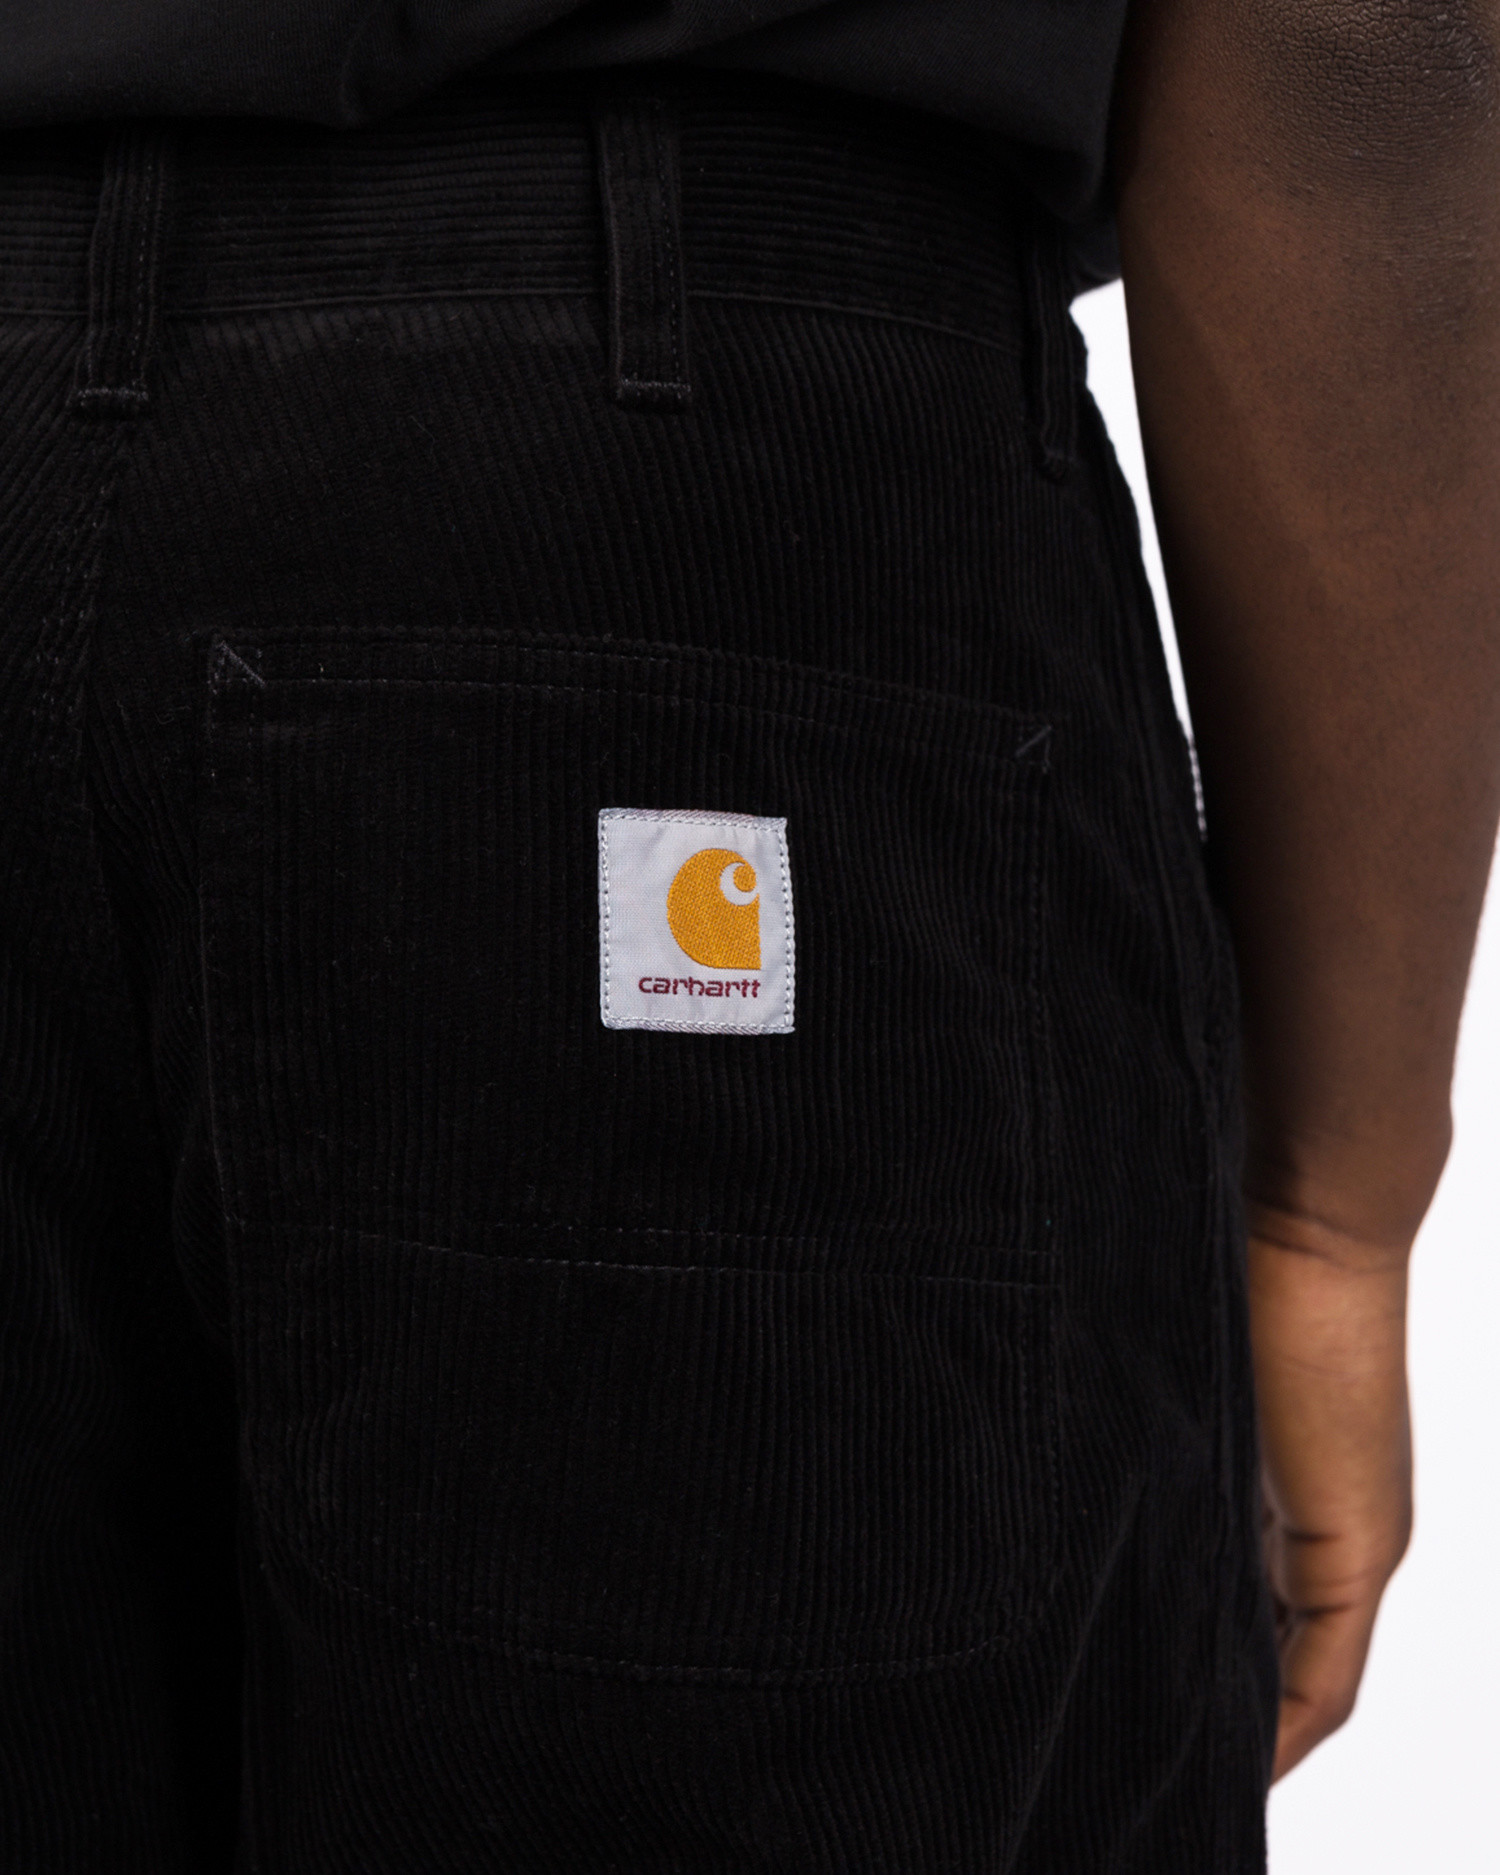 Carhartt Simple Pant Cotton Black Rinsed